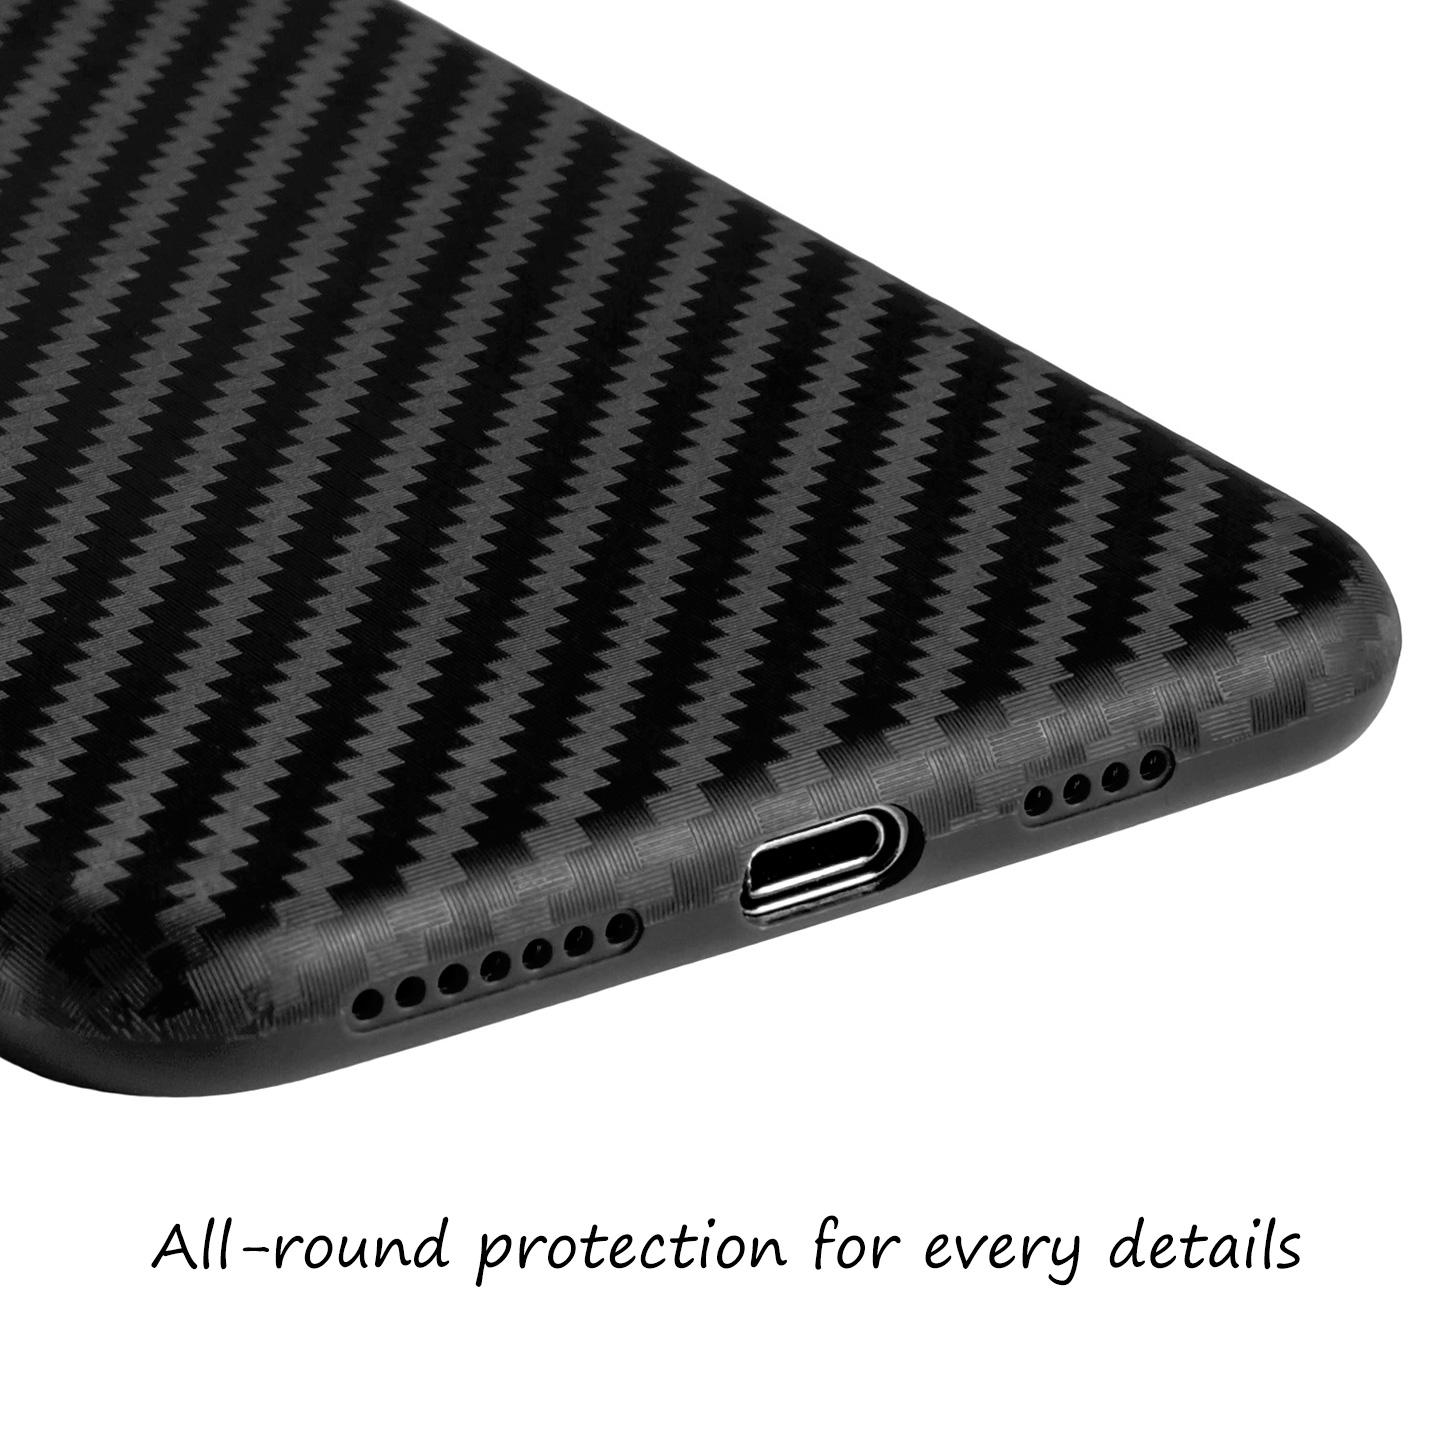 Ultra-Slim-Case-iPhone-11-Pro-5-8-034-Matt-Clear-Schutz-Huelle-Skin-Cover-Etui-Folie Indexbild 12